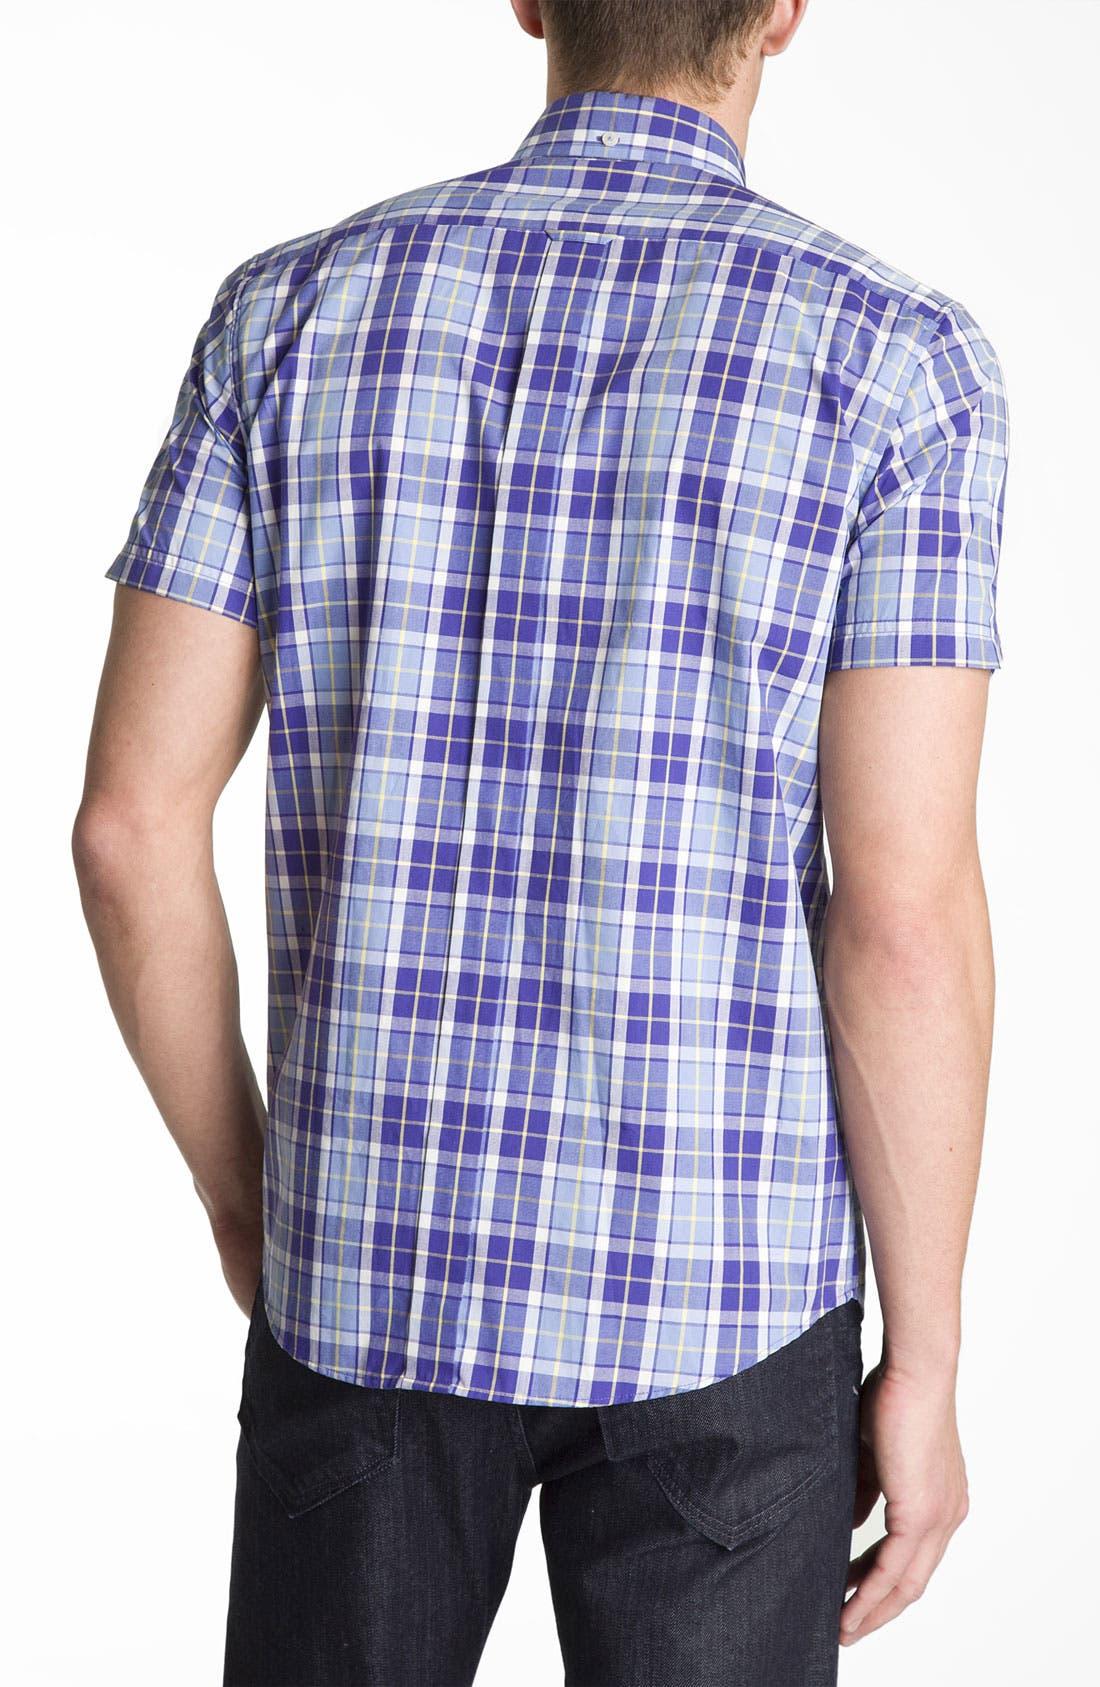 Alternate Image 2  - Ben Sherman 'Covent' Plaid Woven Shirt